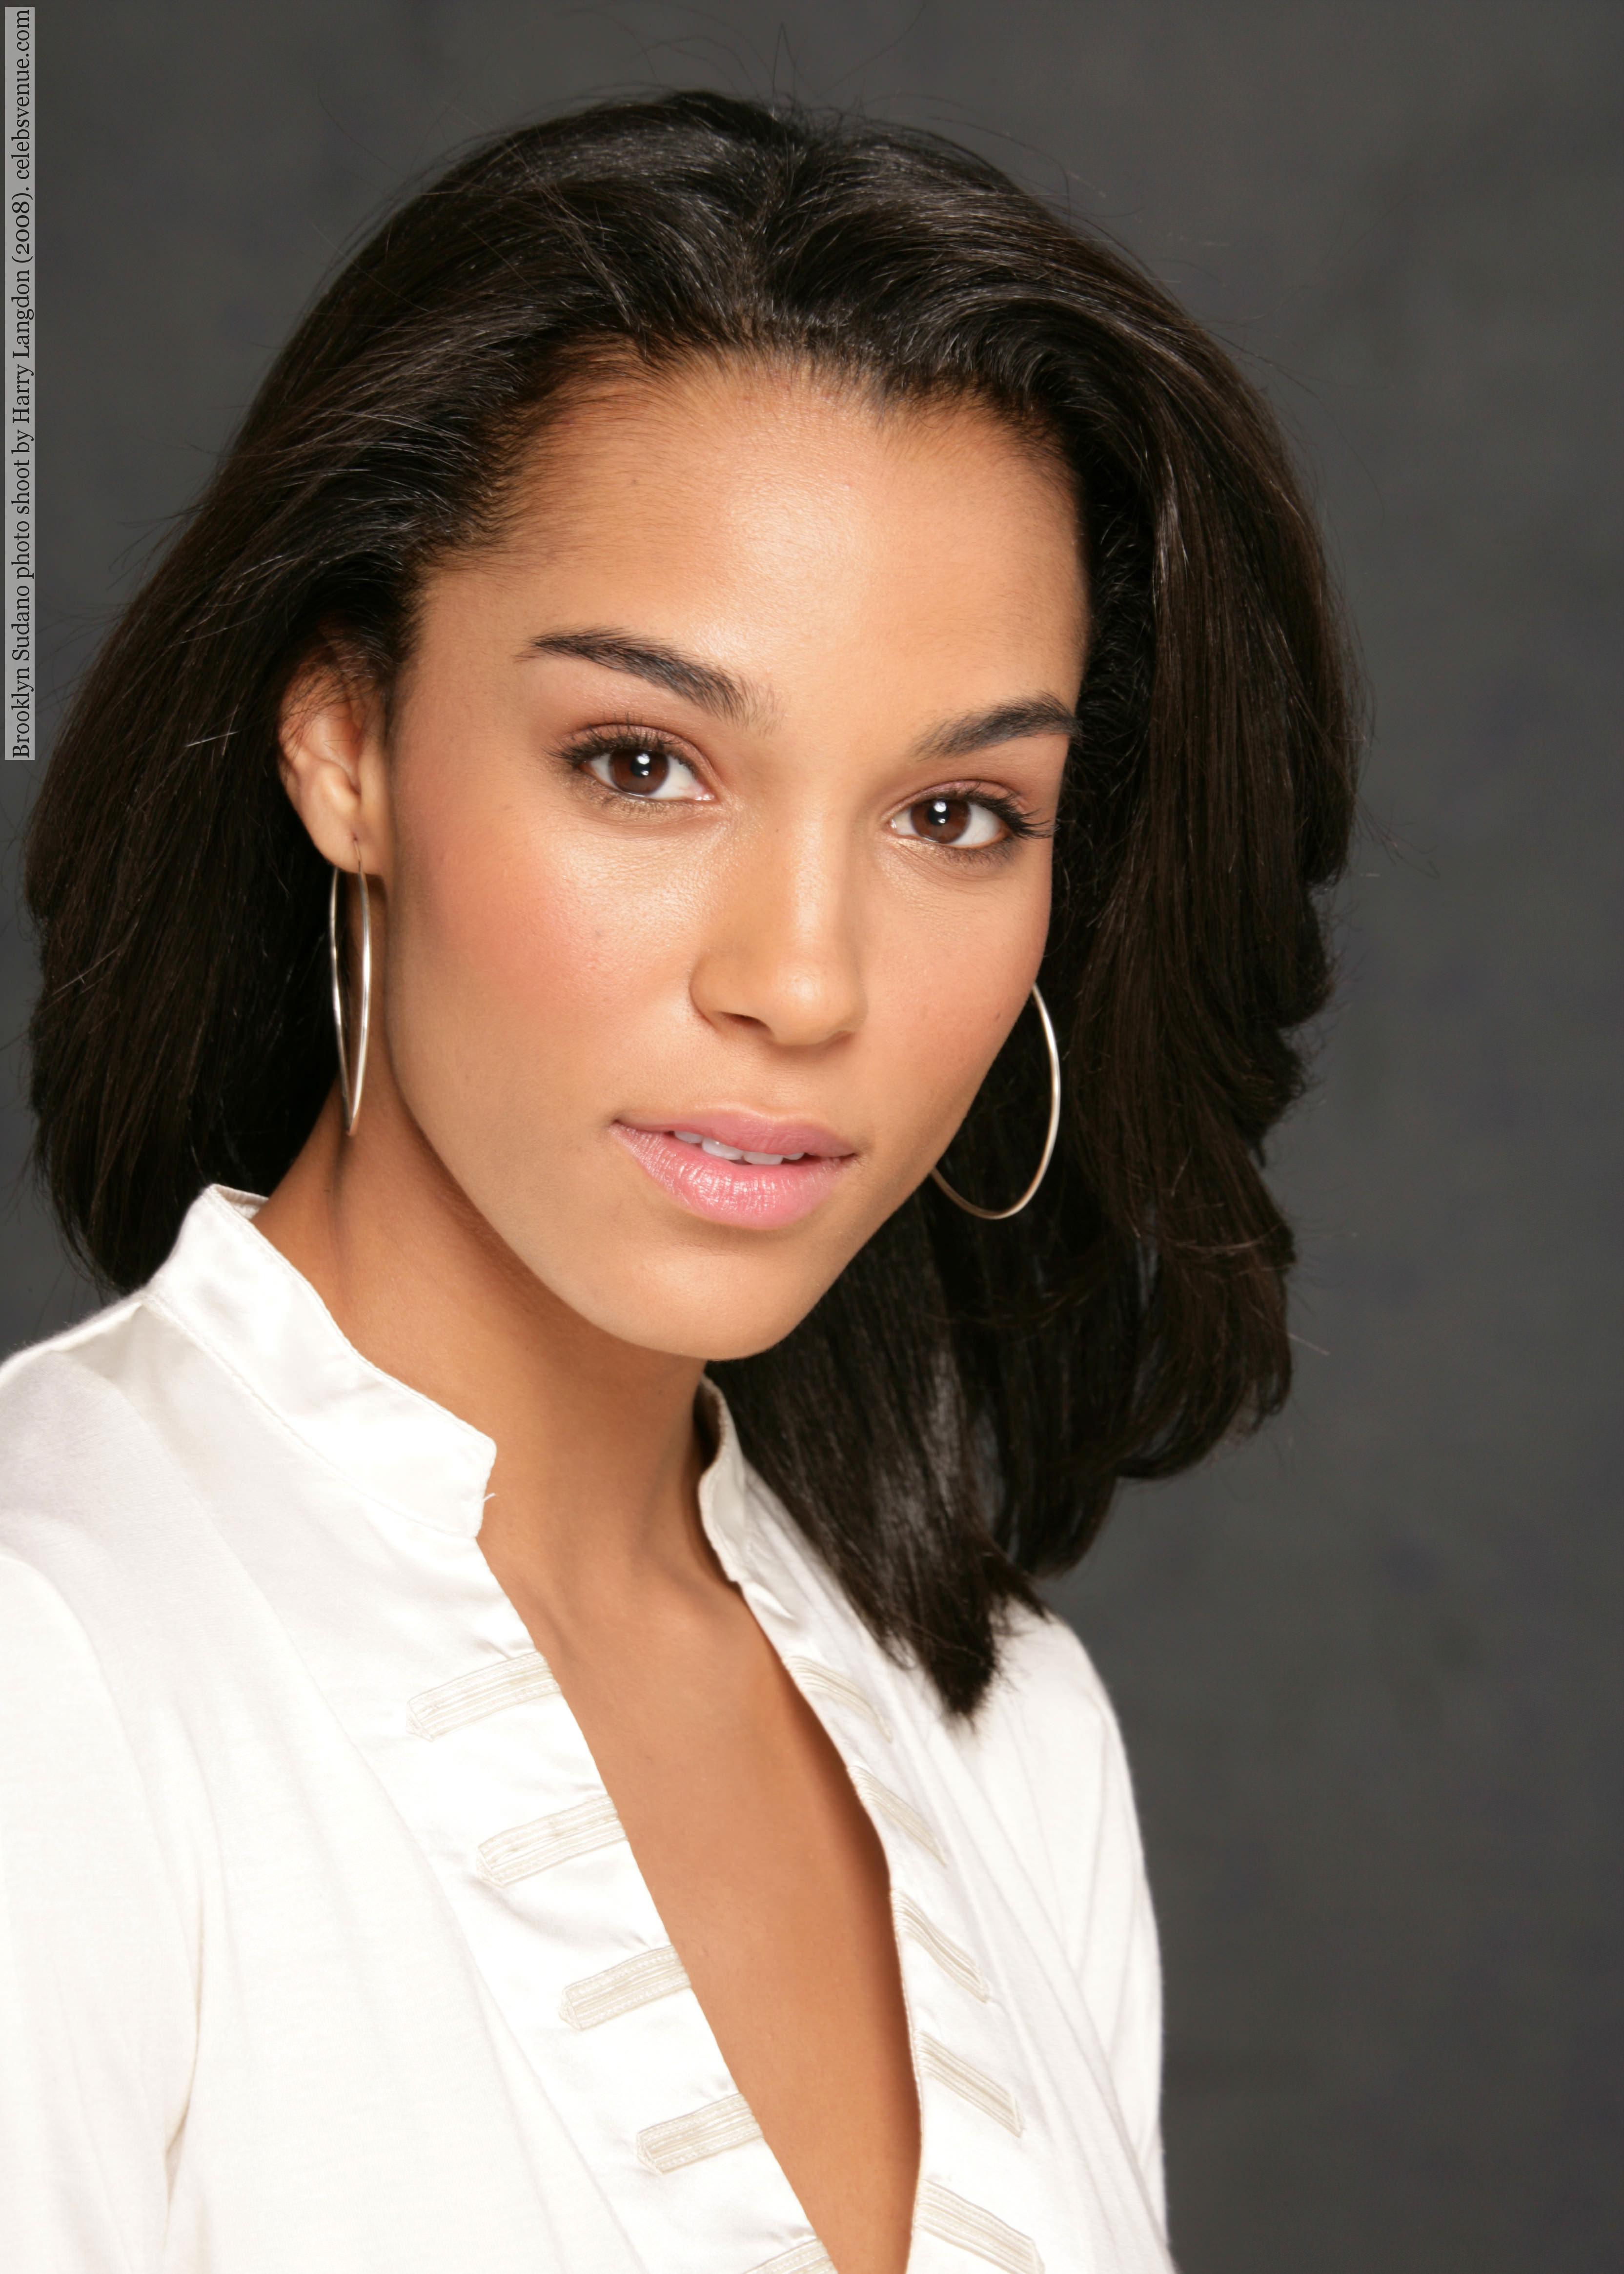 TV Actress Brooklyn Sudano - age: 40